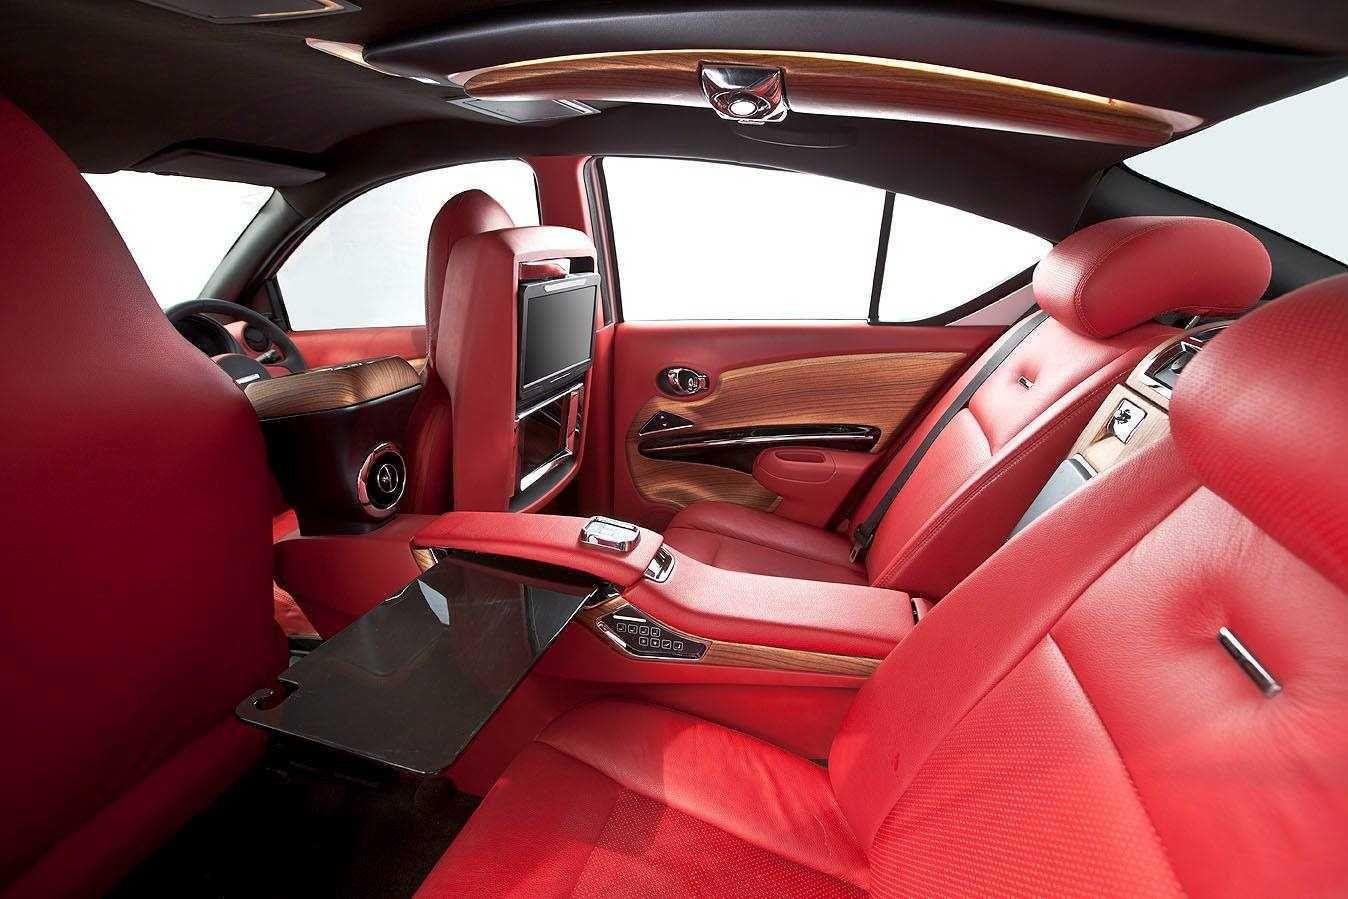 Nissan Versa Sedans Interior Rolls Royce by DC Designs Red Leather